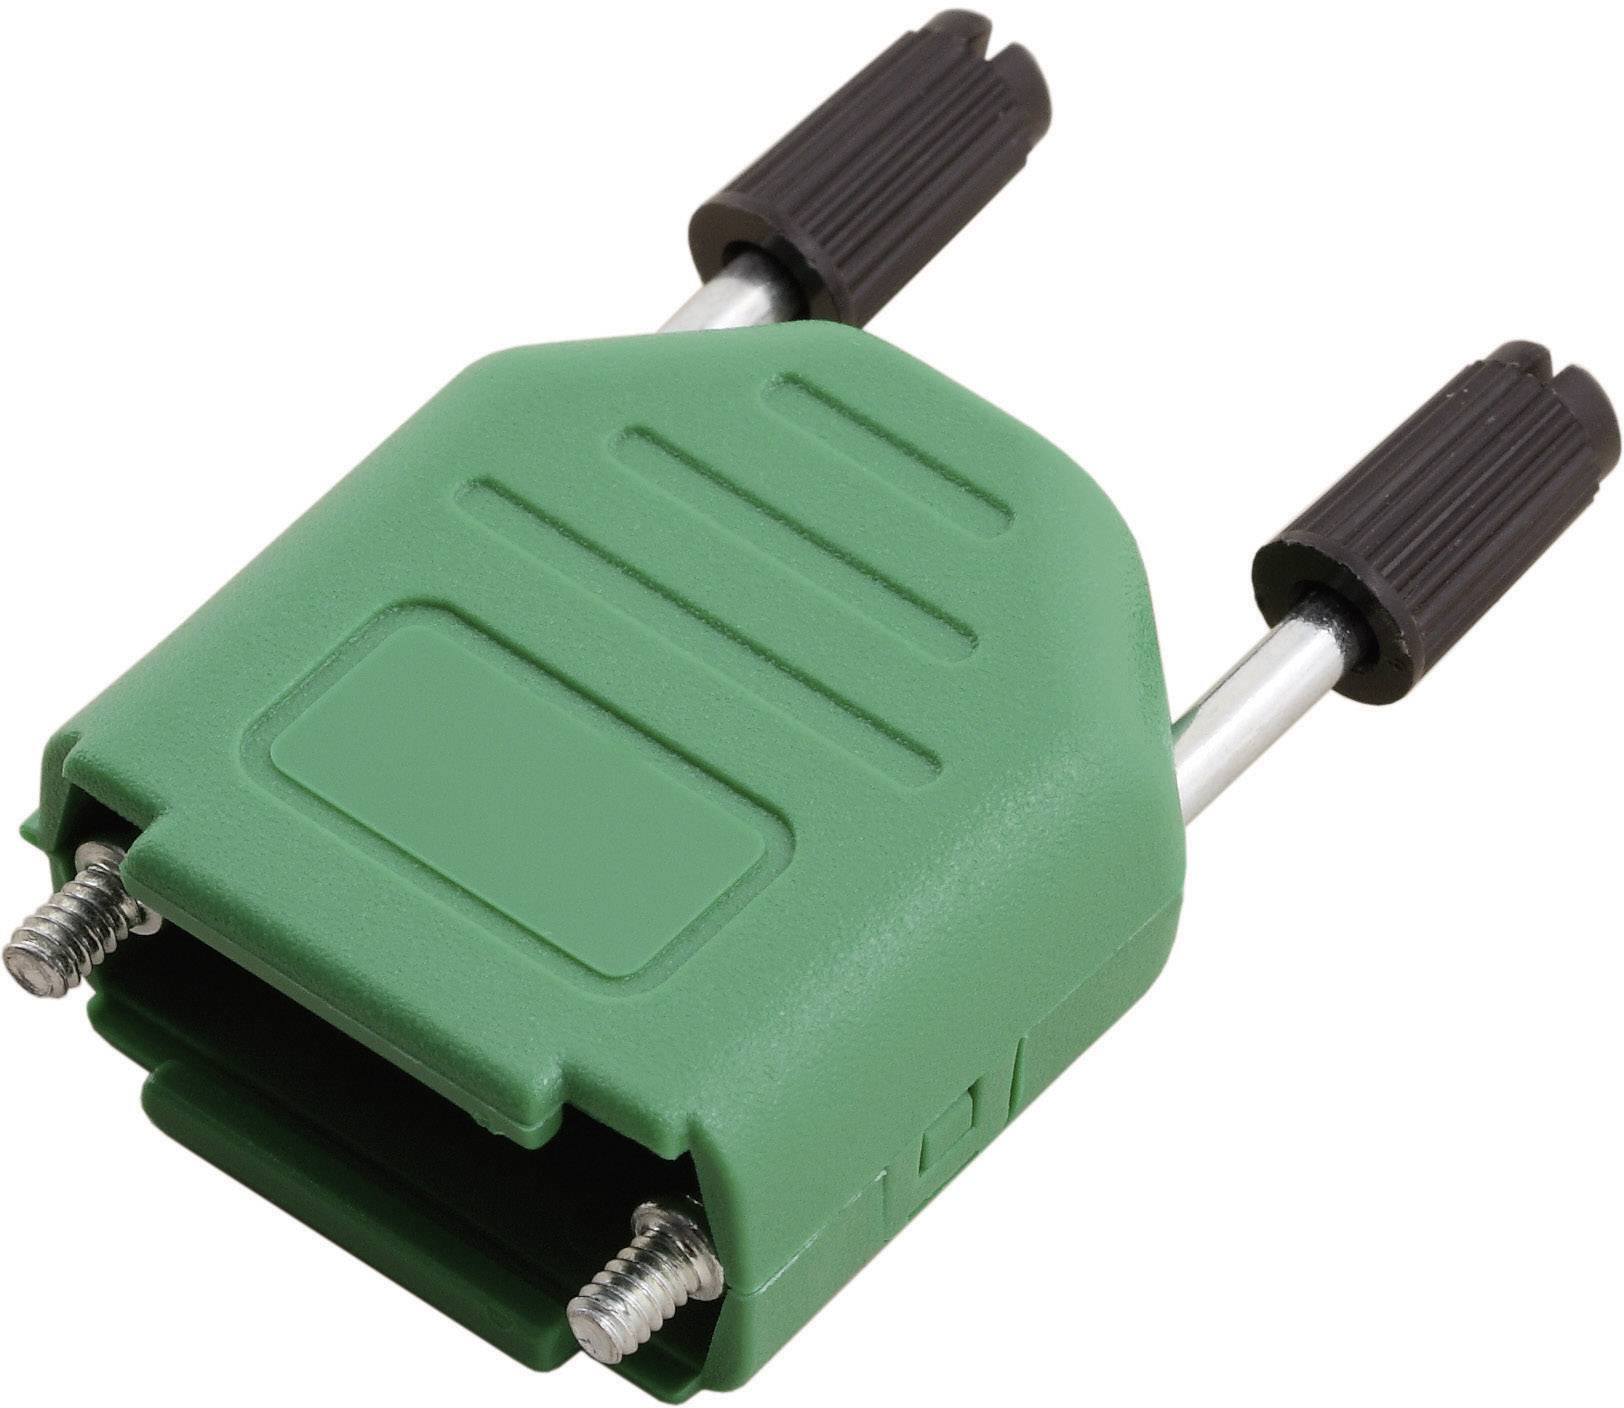 D-SUB púzdro MH Connectors MHDPPK15-G-K 6353-0106-02, počet pinov: 15, plast, 180 °, zelená, 1 ks